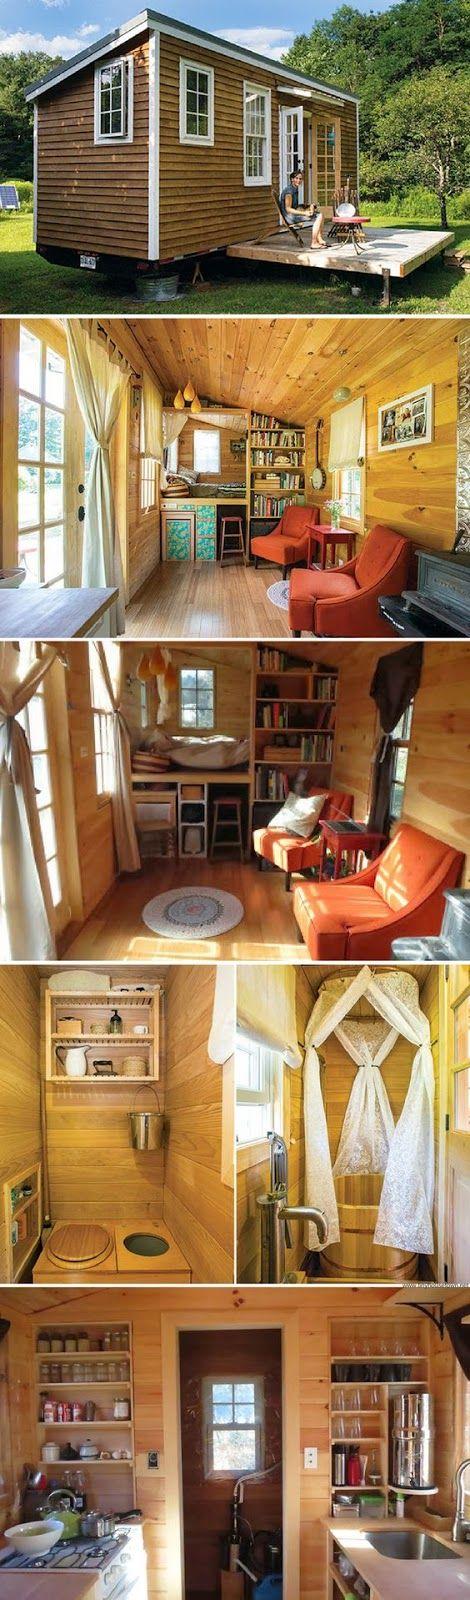 mytinyhousedirectory: Rowan Kunz Tiny House | tiny house | Pinterest ...